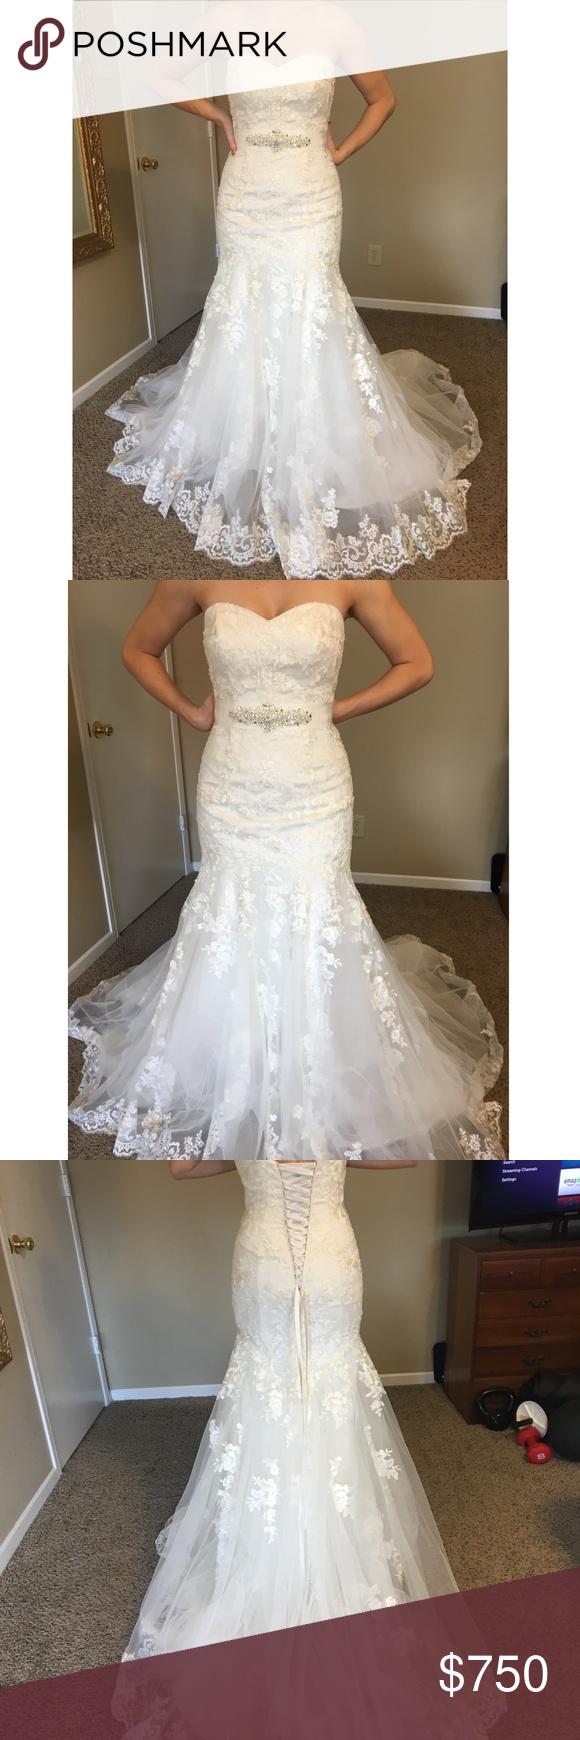 b929cea54ea3 Wedding dress (unaltered new) Alfred Angelo 2506 Alfred Angelo Dresses  Wedding